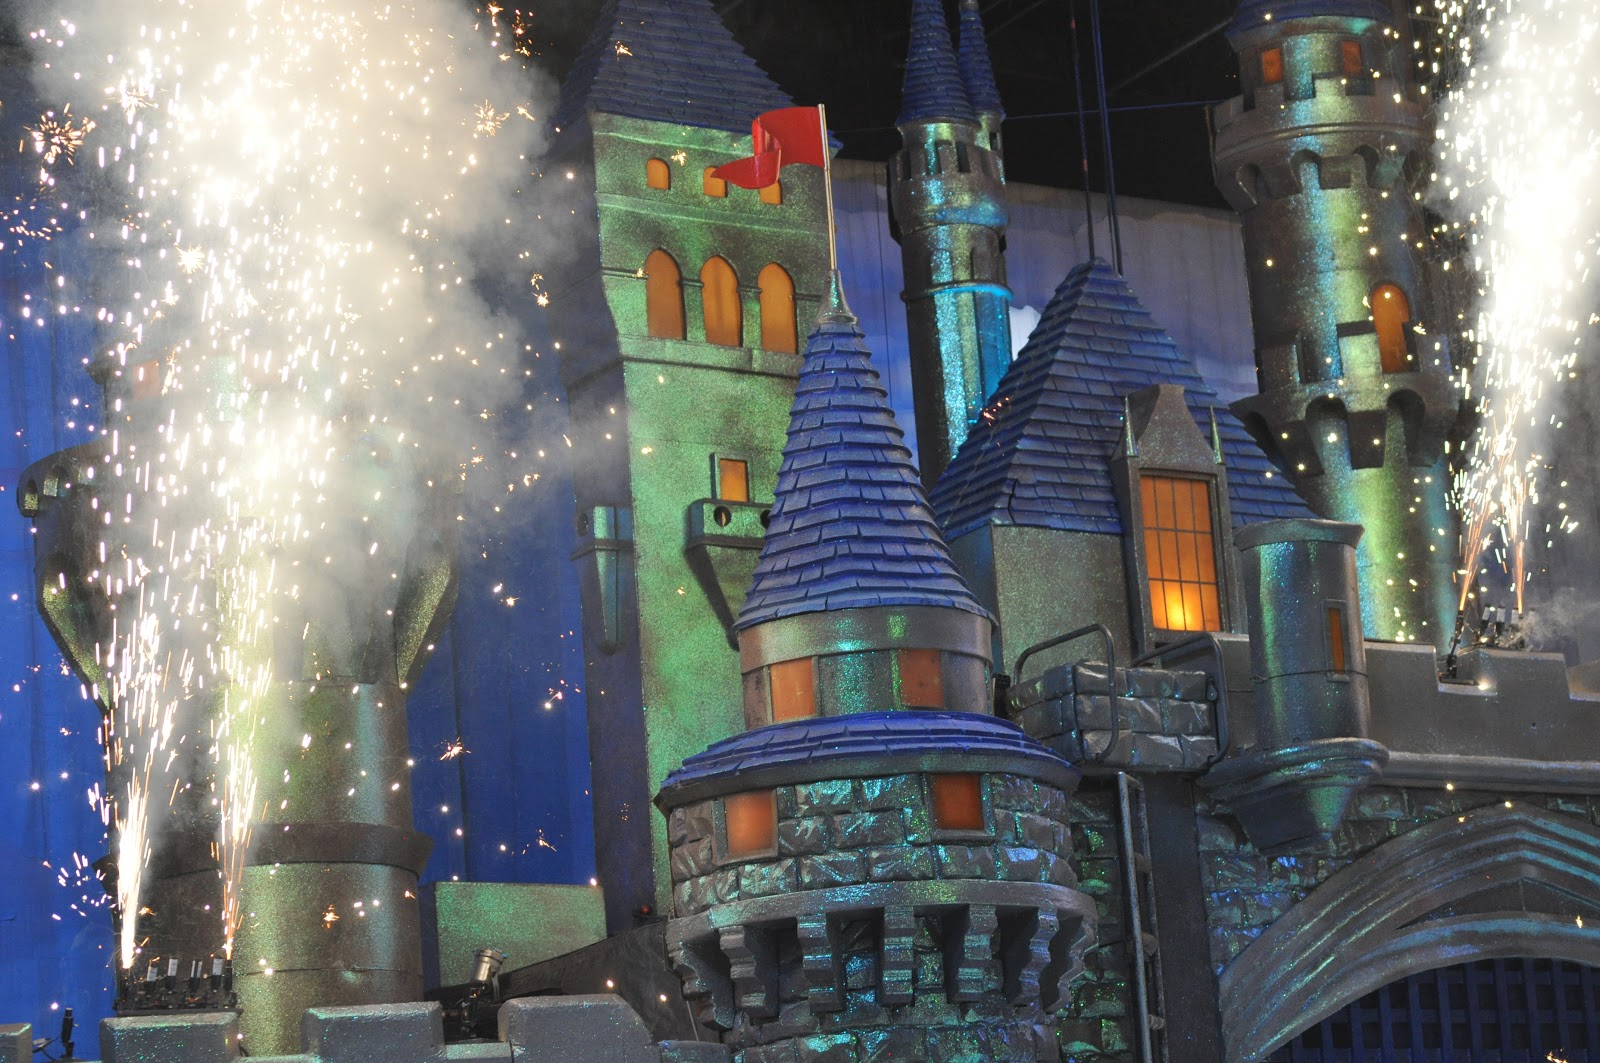 Disney, Disney blog, Disneyland, Disney fan, Disney lover, magical kingdom, what to do at Disneyland, Disney fashion, California adventure, California advenure food, whre to eat at California adventure, Disney apparel, Disney food, Disney food review, mickey mouse ears, where to eat at Disneyland, fashion blog, fashion blogger, style blog, style blogger, mens fashion, mens fashion blog, mens style, mens style blog, womens style blog, anthropologie ootd blog, anthropologie ootd, anthropologie, ootd, mens ootd, womens ootd,